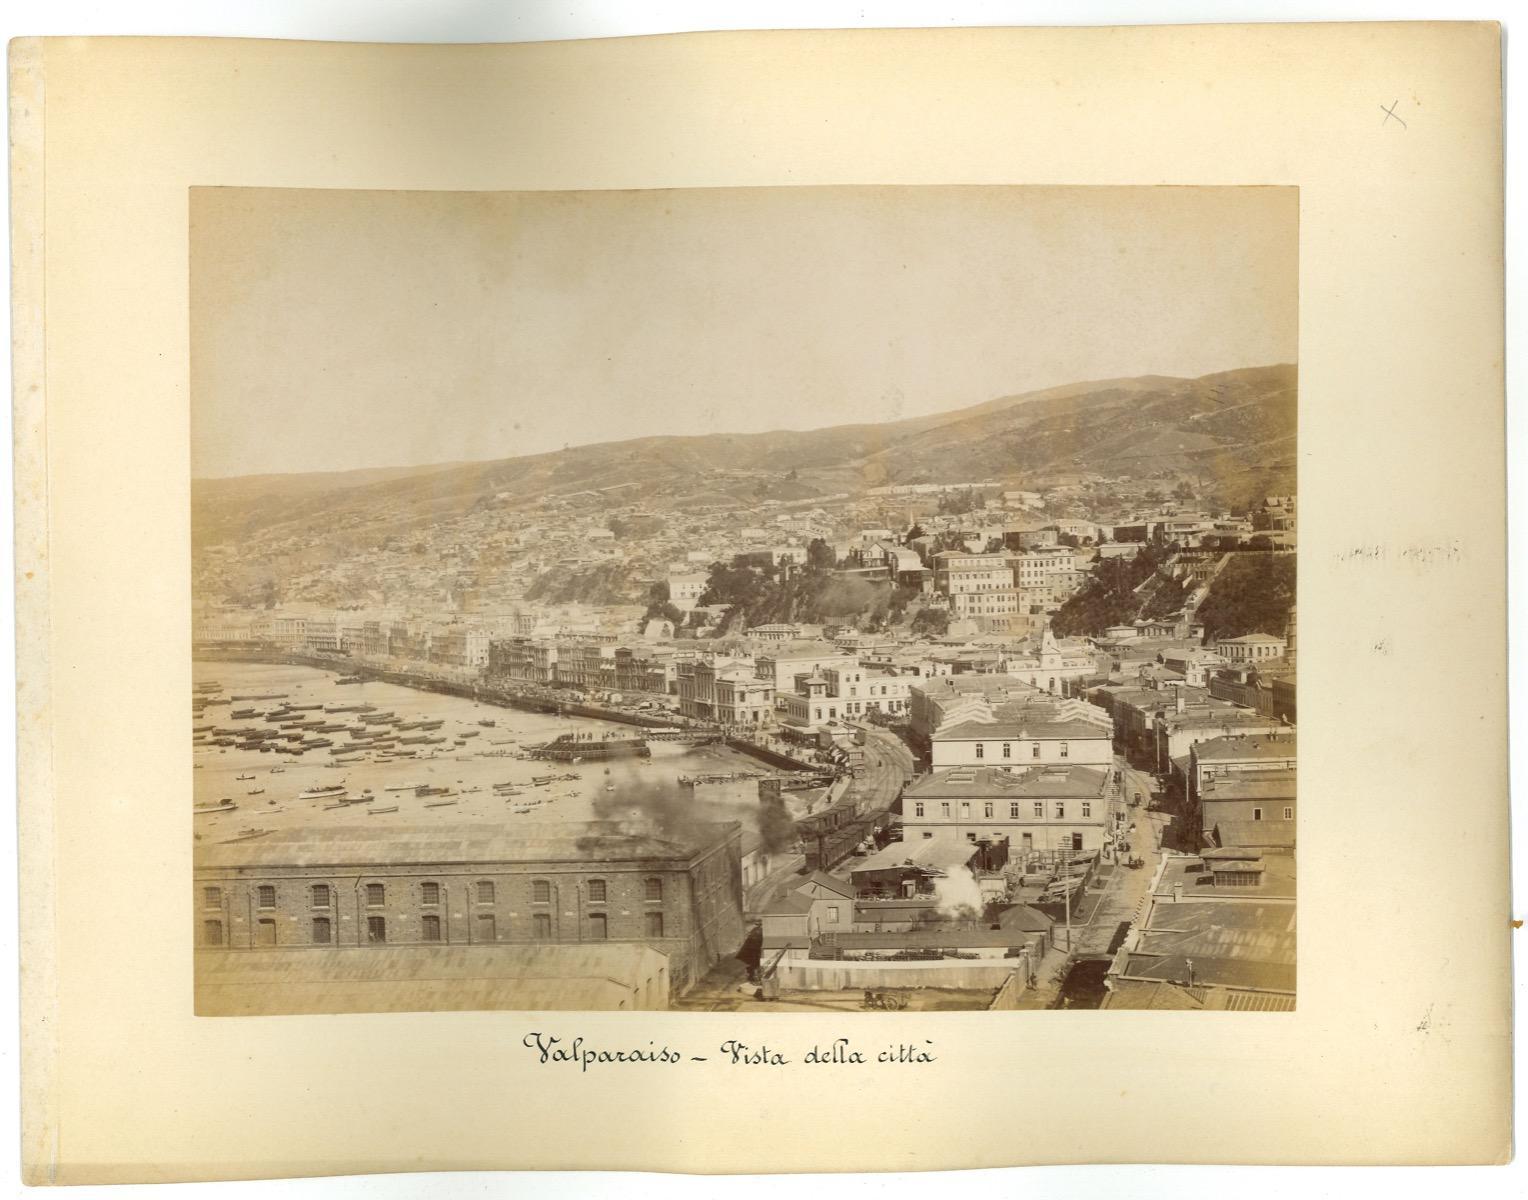 Ancient View of Valparaiso Chile - Original Vintage Photos - 1880s